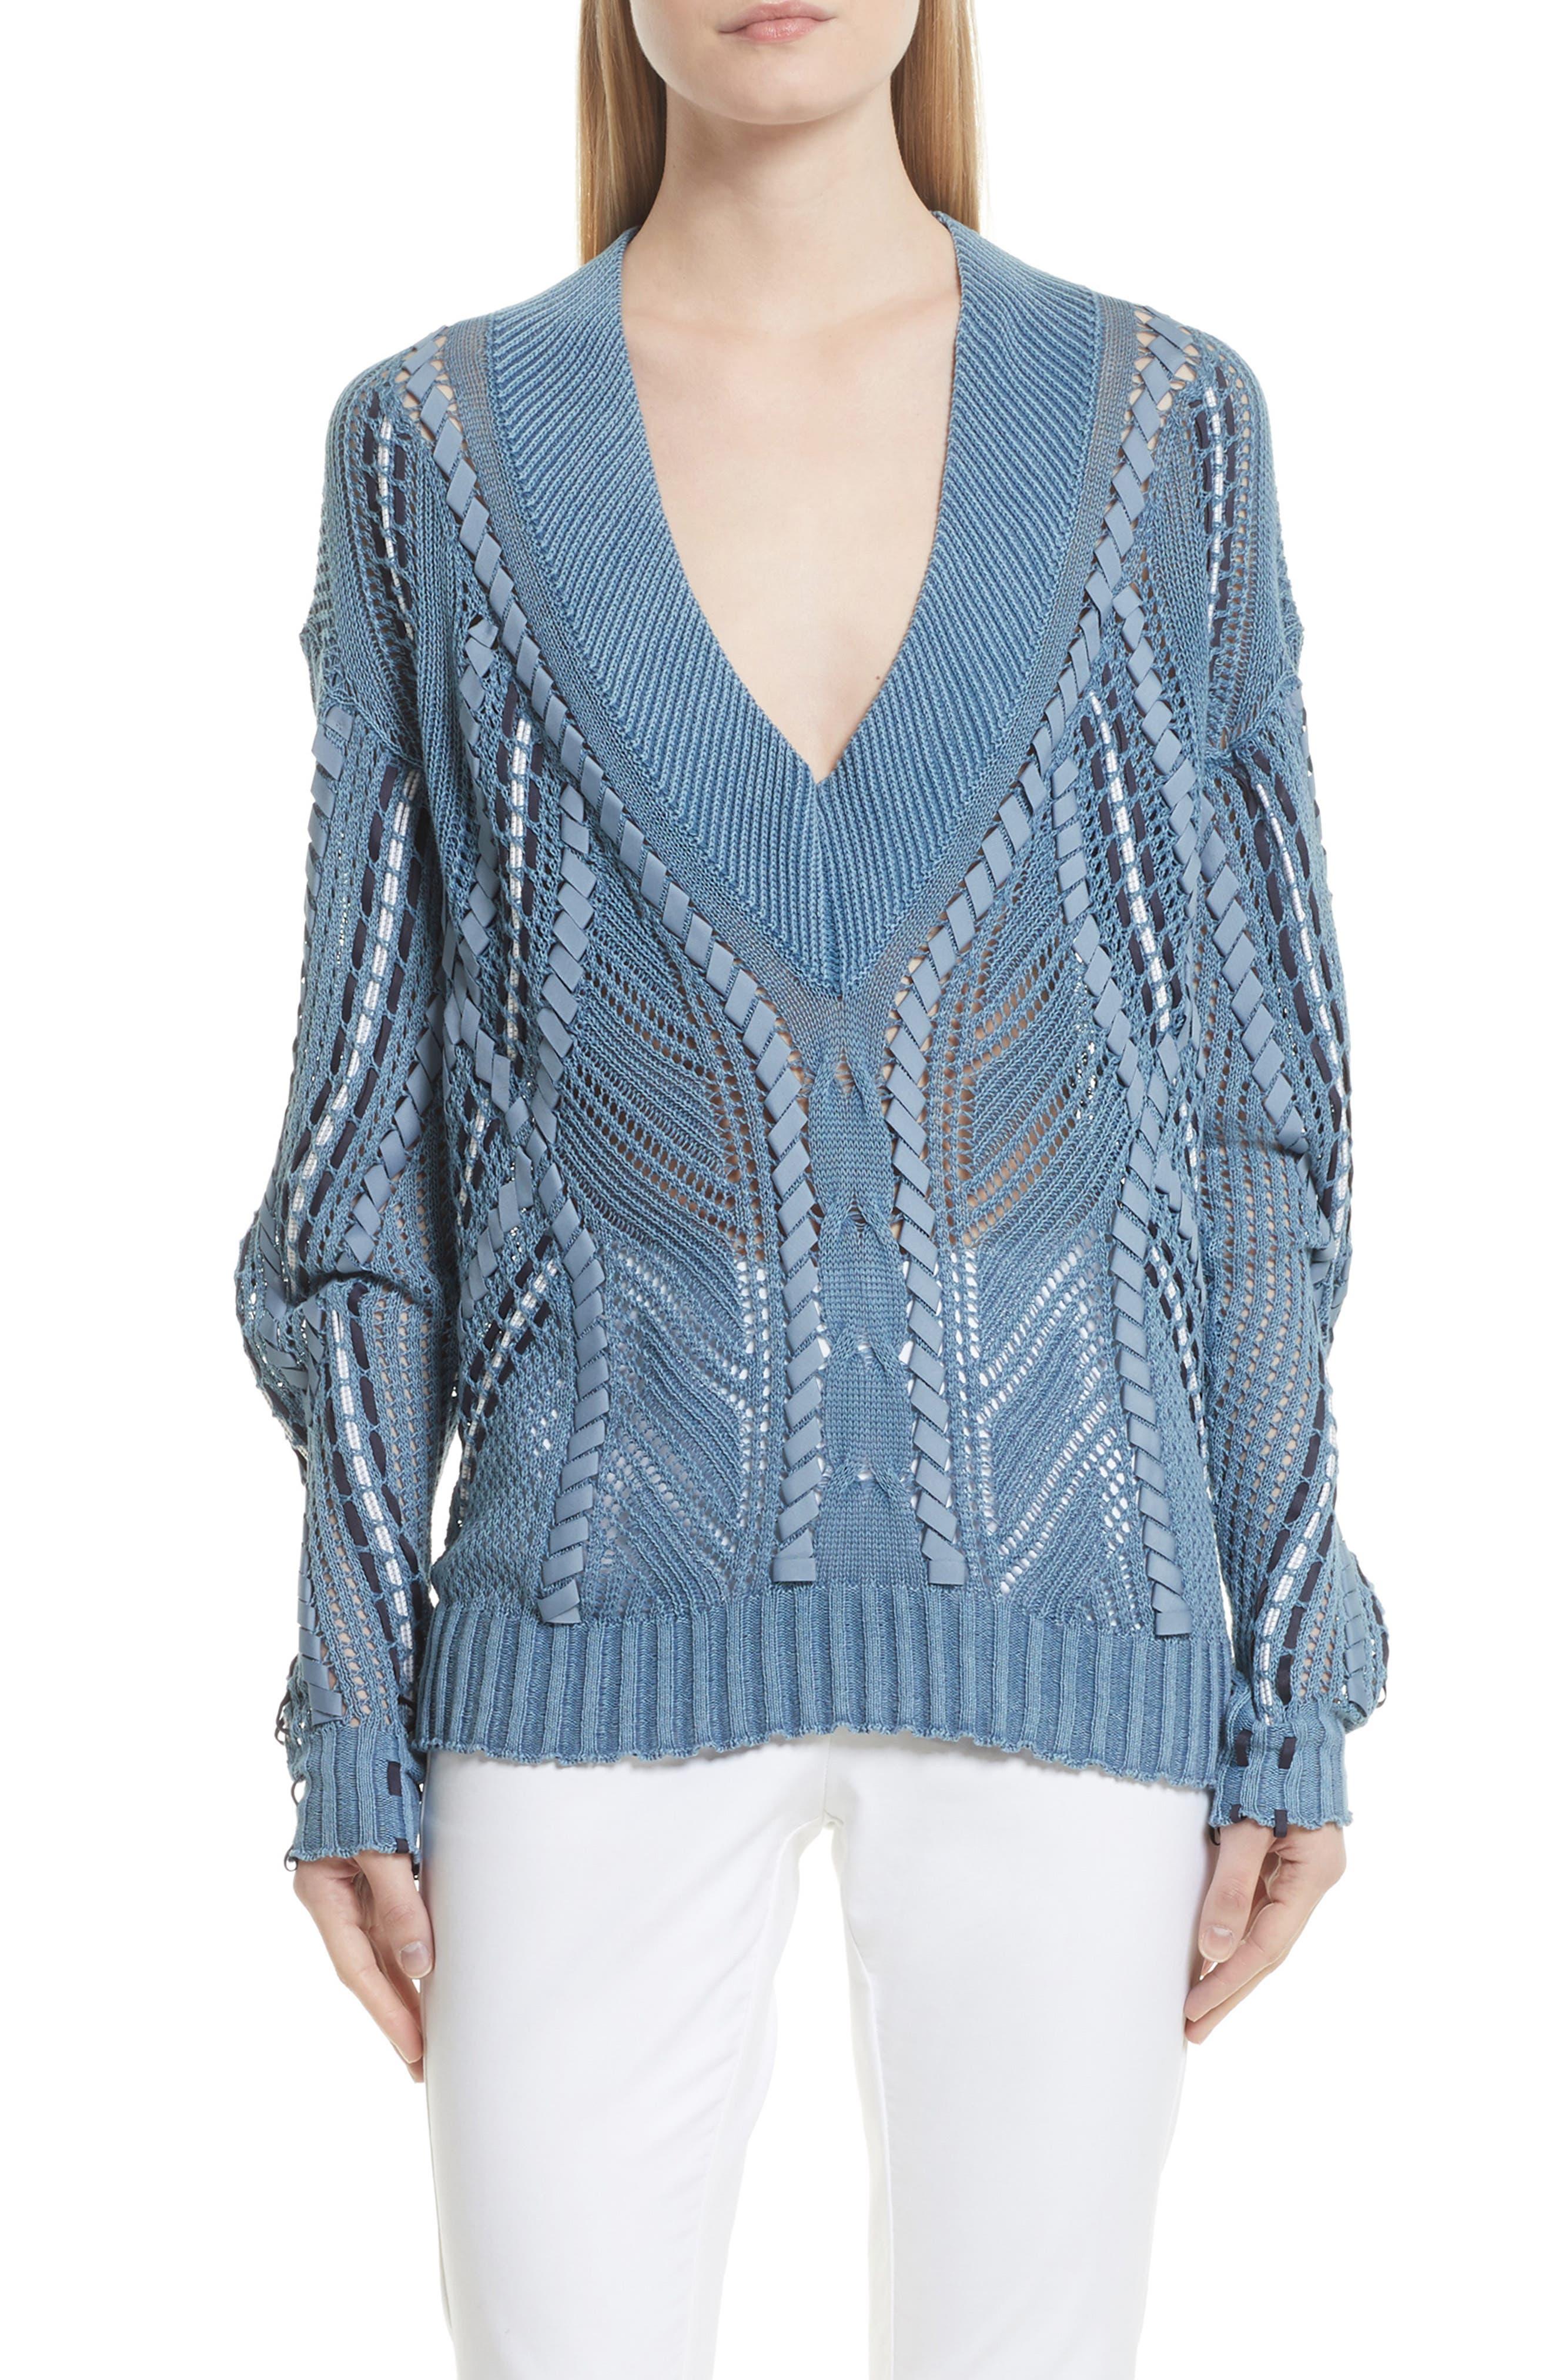 Lucie Pointelle Knit Cotton Blend Sweater,                             Main thumbnail 1, color,                             Indigo